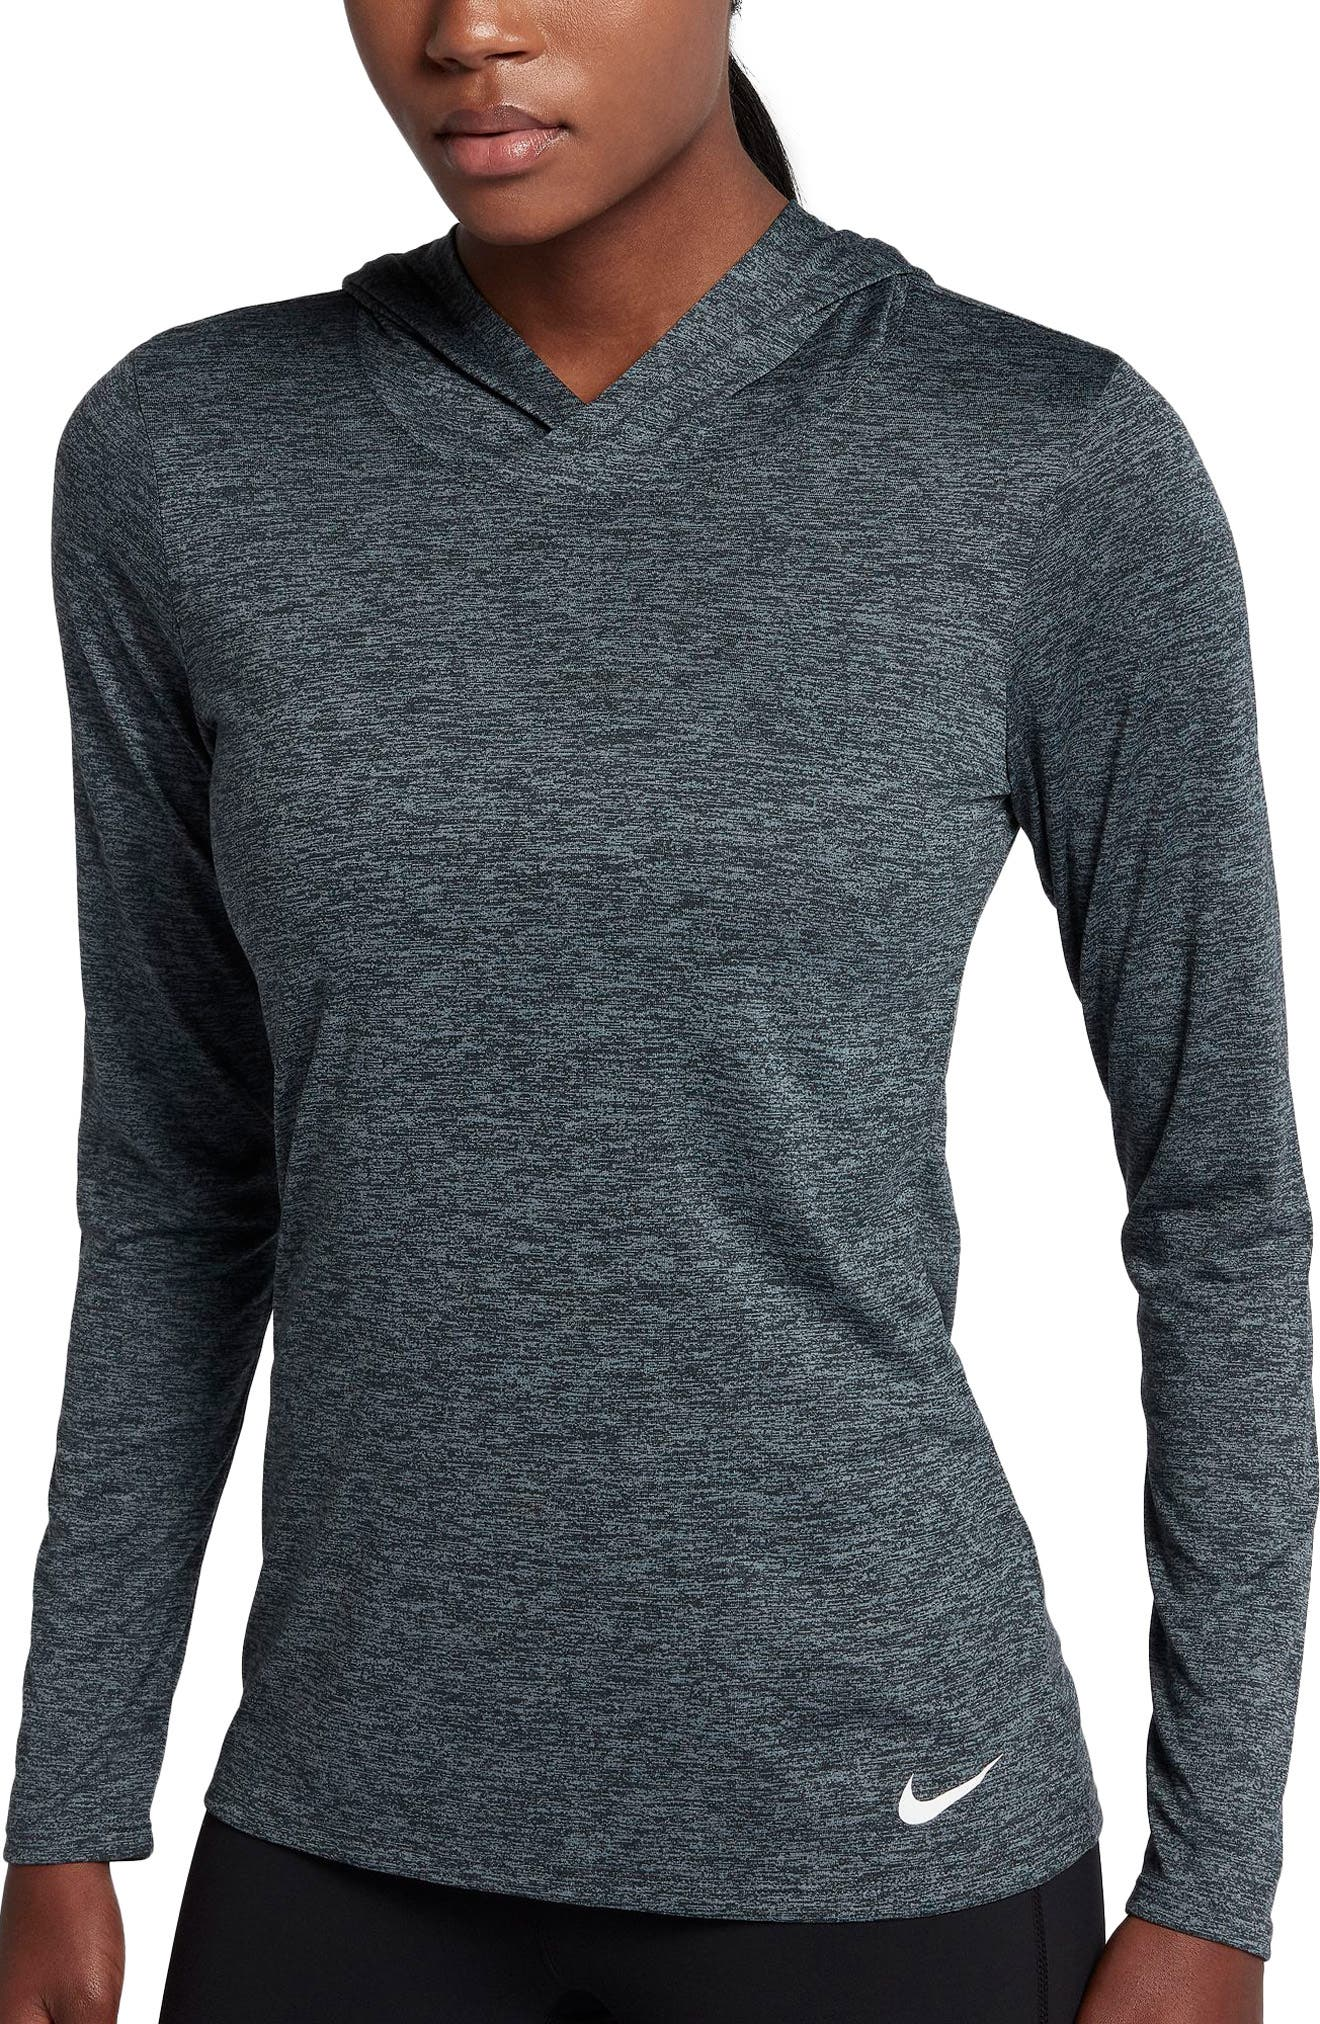 Alternate Image 1 Selected - Nike Dry Legend Hooded Training Top